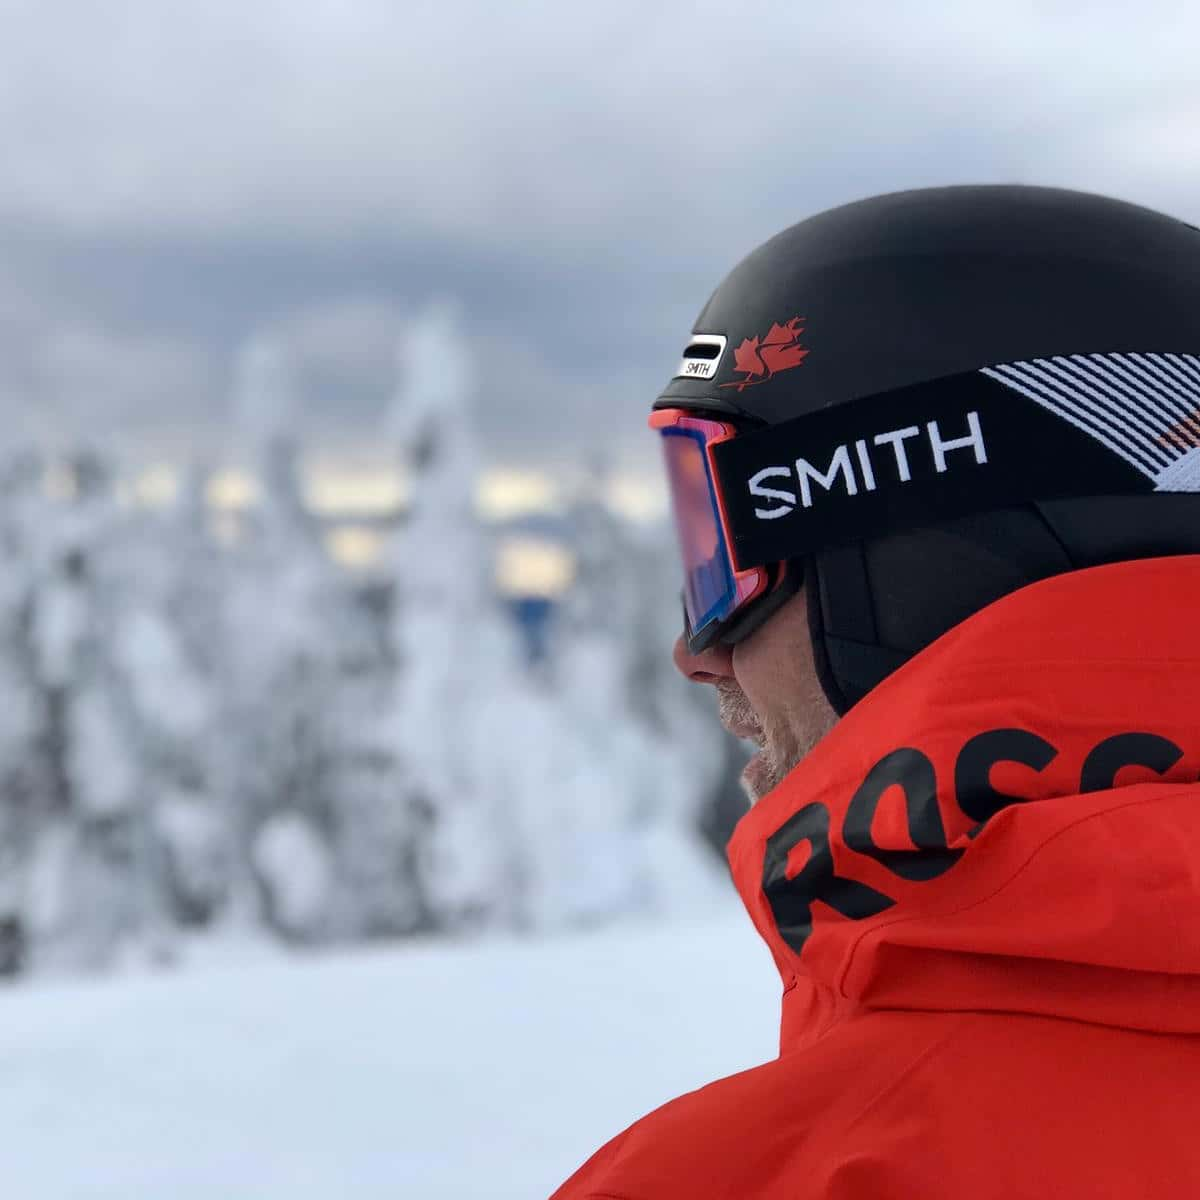 2020 Smith Maze Adult Helmet